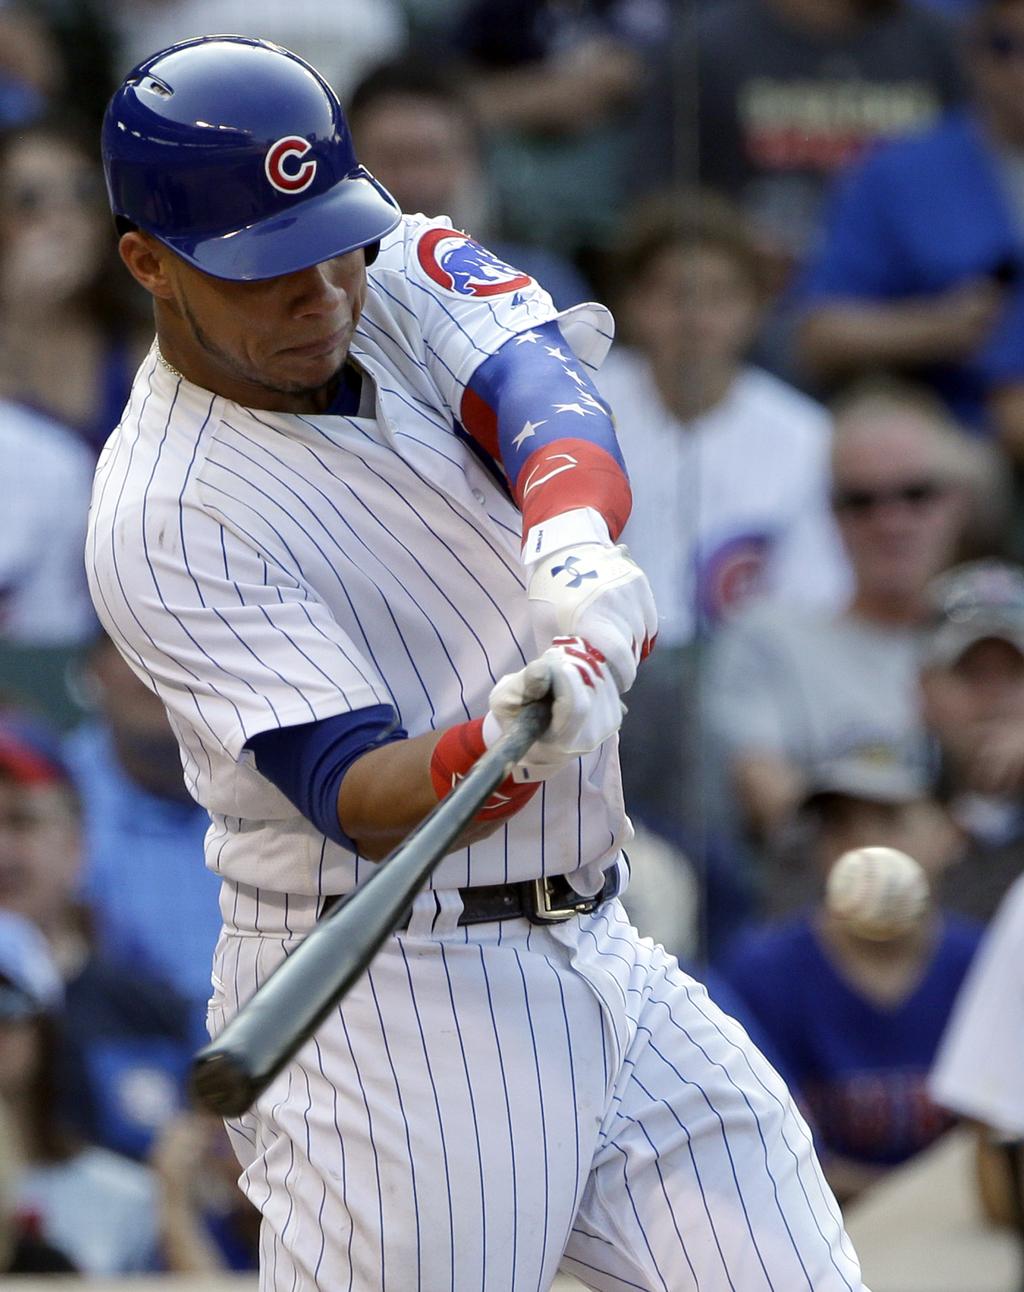 Chicago Cubs' Willson Contreras hits a three-run home run against the Arizona Diamondbacks during the sixth inning of a baseball game Thursday, Aug. 3...